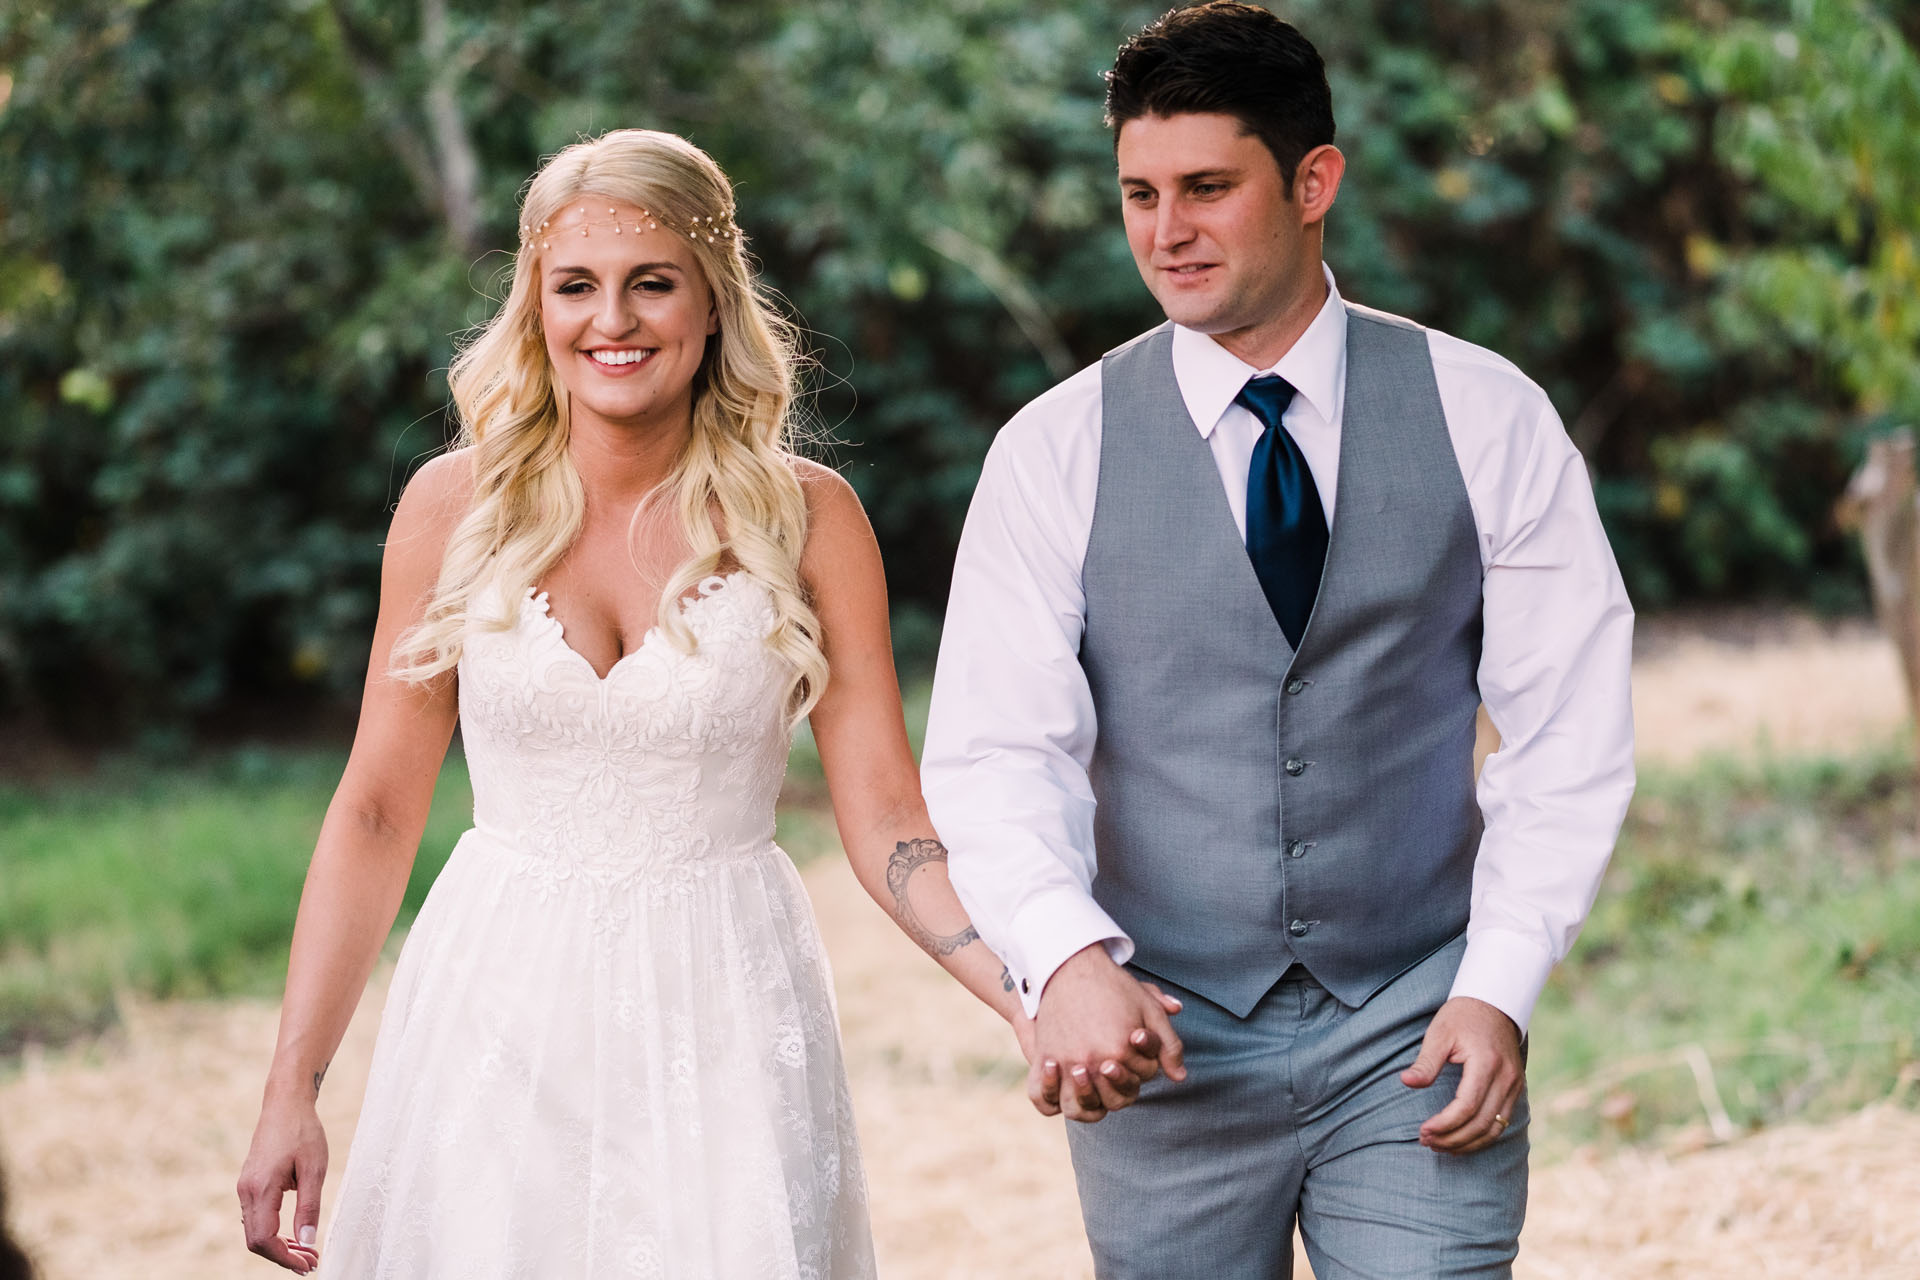 10-7-17 Devon and Jordan's Wedding-142.jpg